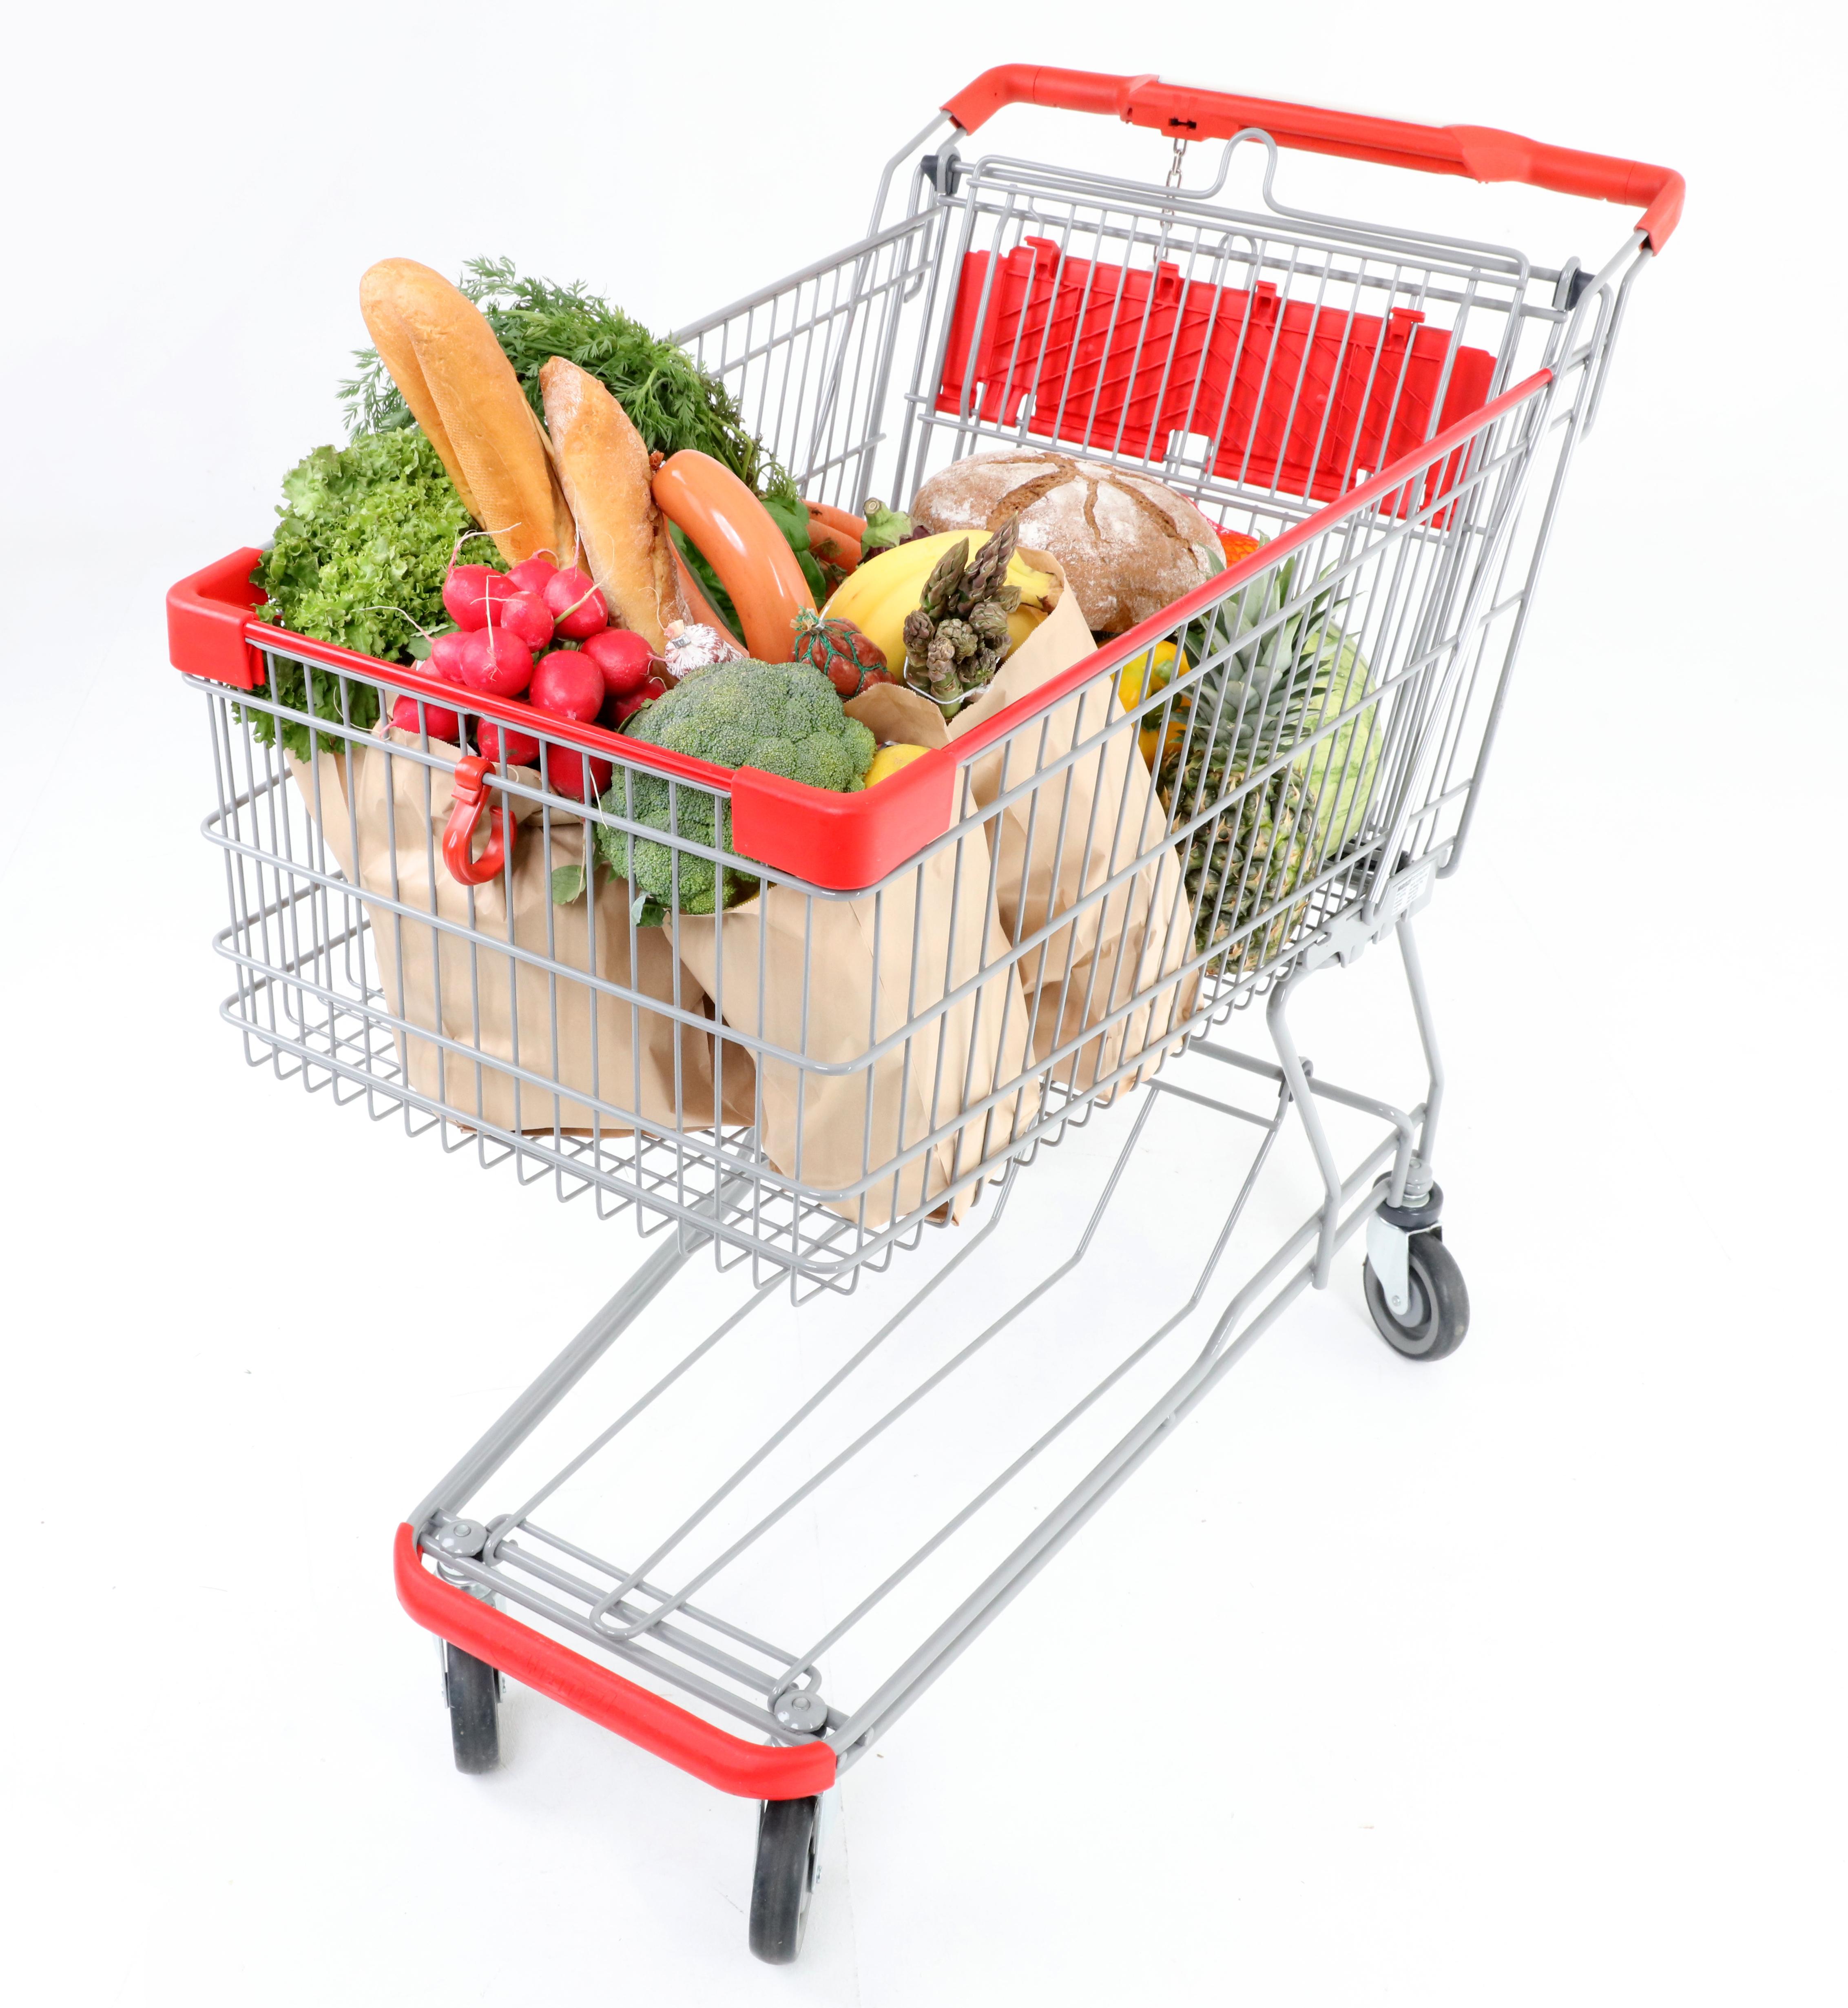 Shopping cart - Wikipedia